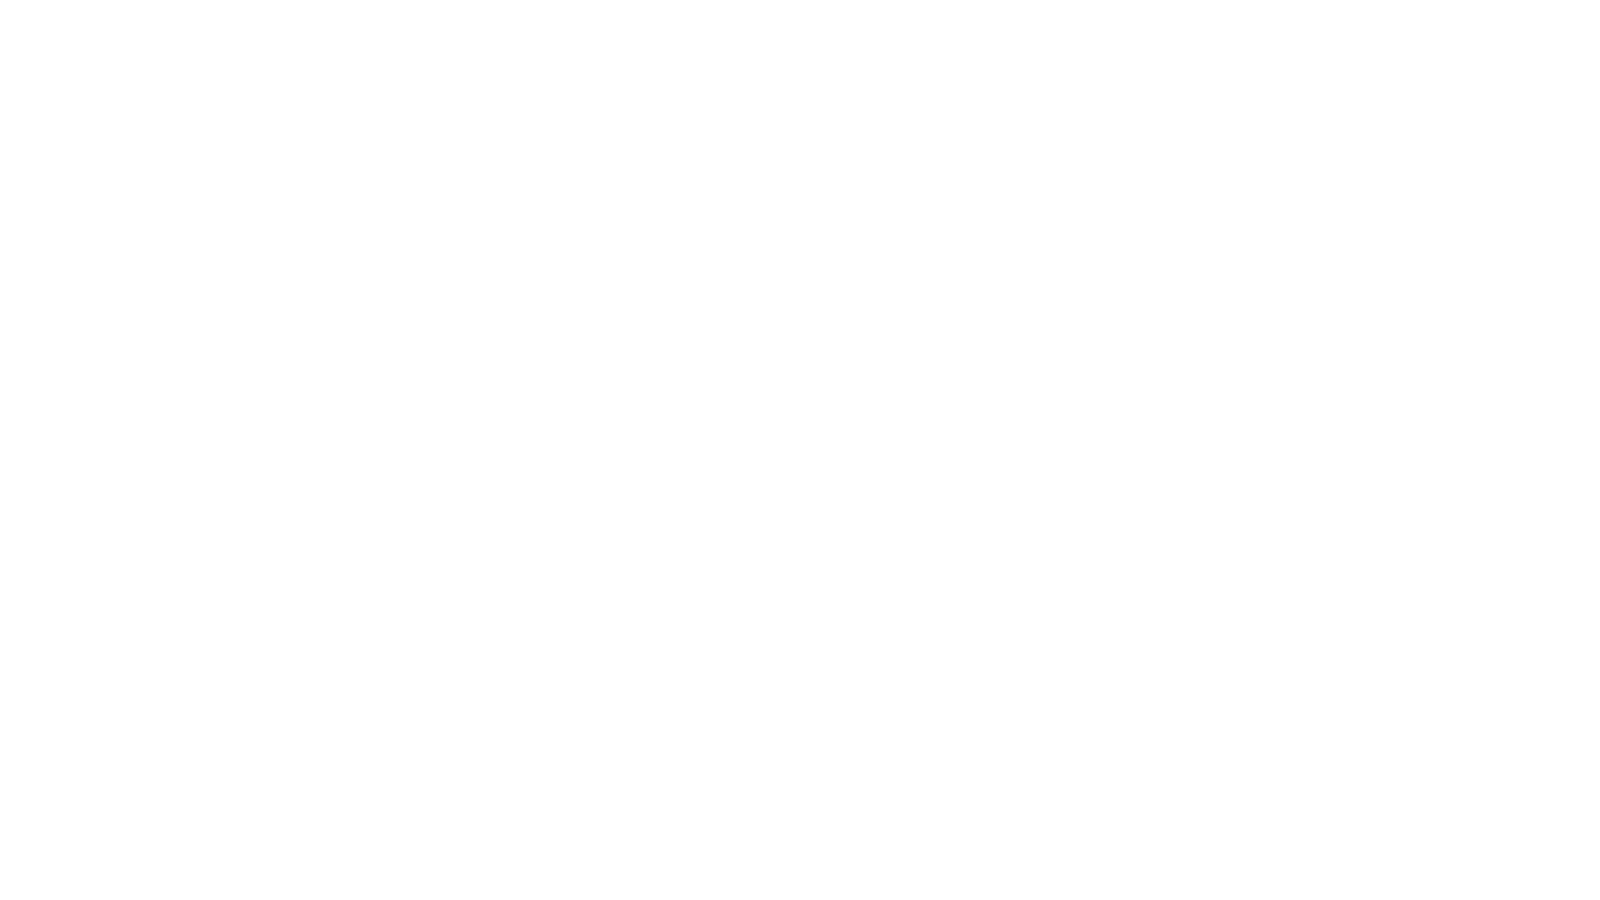 Another assignment for the EAC (Engaged Art Conversation) class of the Prins Claus Conservatory.  Music & Lyrics: Johan Boekema Vocals: Stephanie Lopes Parente Violin(s): Viktoria Daskalova Cello: Galya Sky Bass Guitar: Joost van der Bijl  Drums: Christan Rockeman Piano: Dimitris Karkoulias Guitar: Bart Winters Flugel/Recorder/Vocals: Johan Boekema